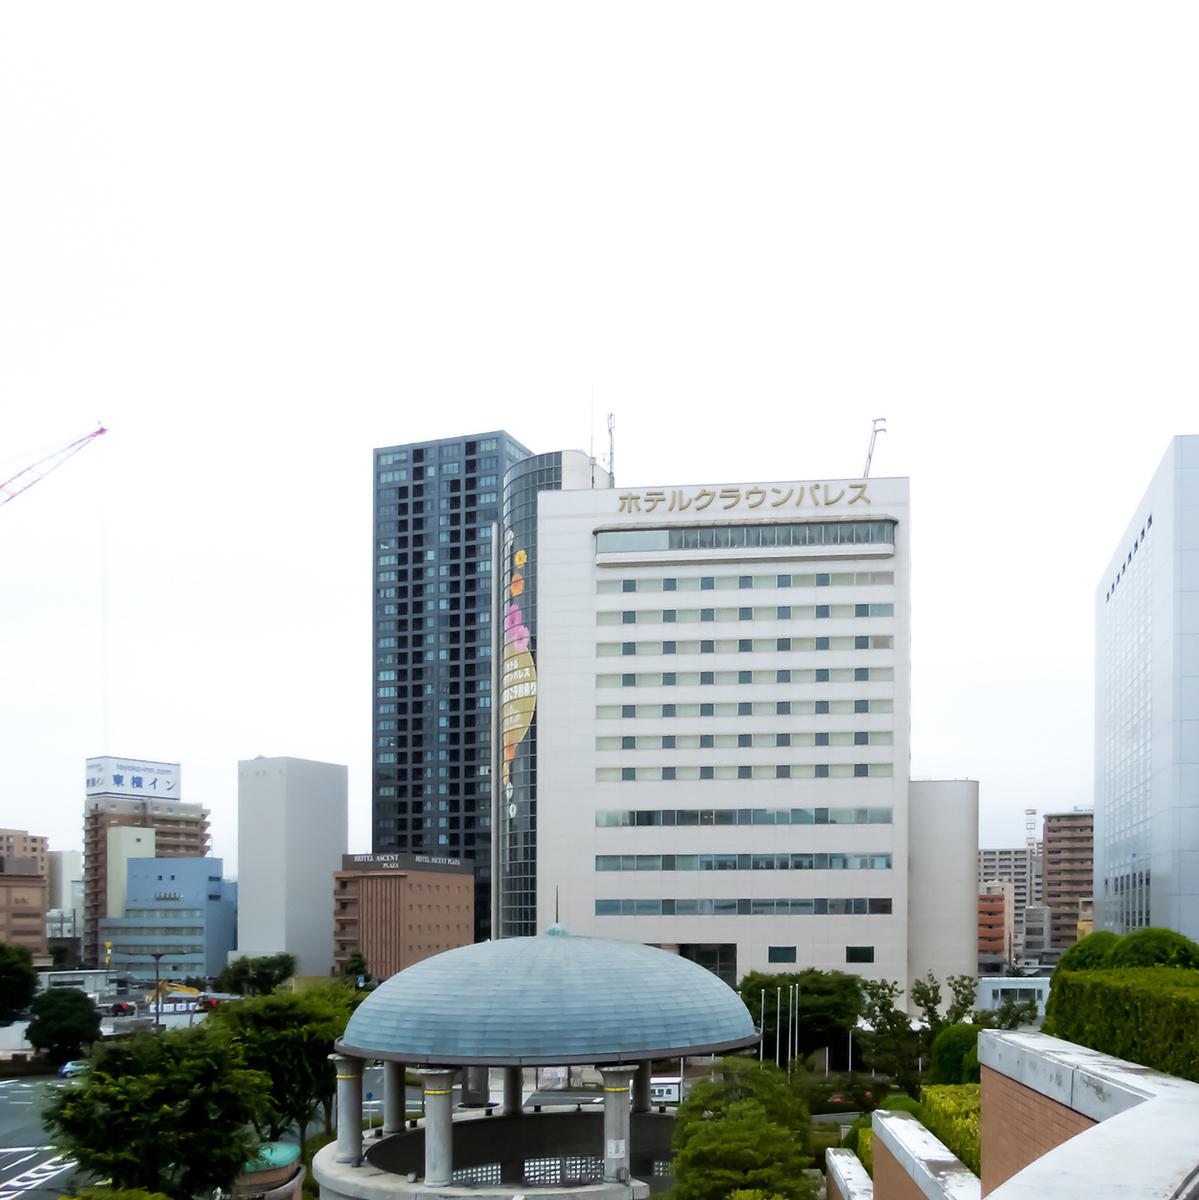 Hotel Crown Palace地下一層★沿Hirokoji★酒店,易於理解★從JR濱松站步行3分鐘★清酒和Waki以及肉類和蔬菜Hamamatsu車站前店♪